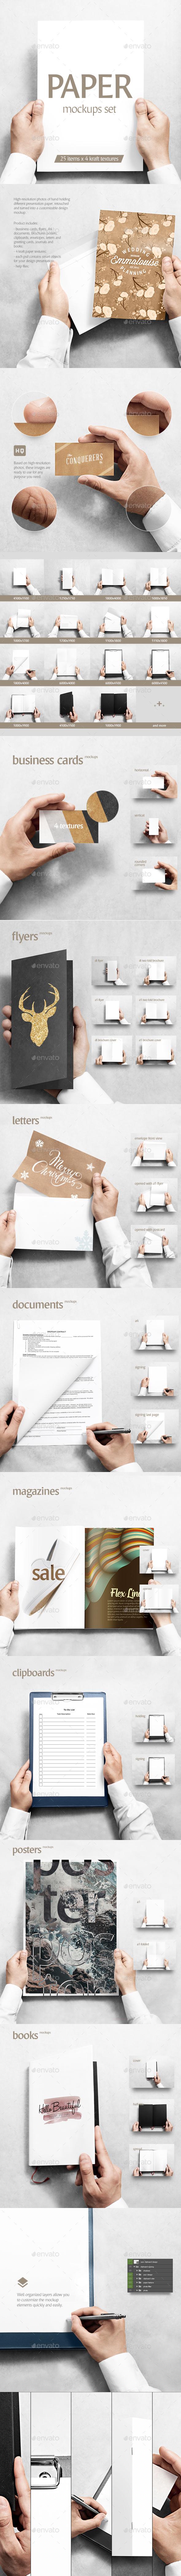 Paper Mockups Set - Print Product Mock-Ups